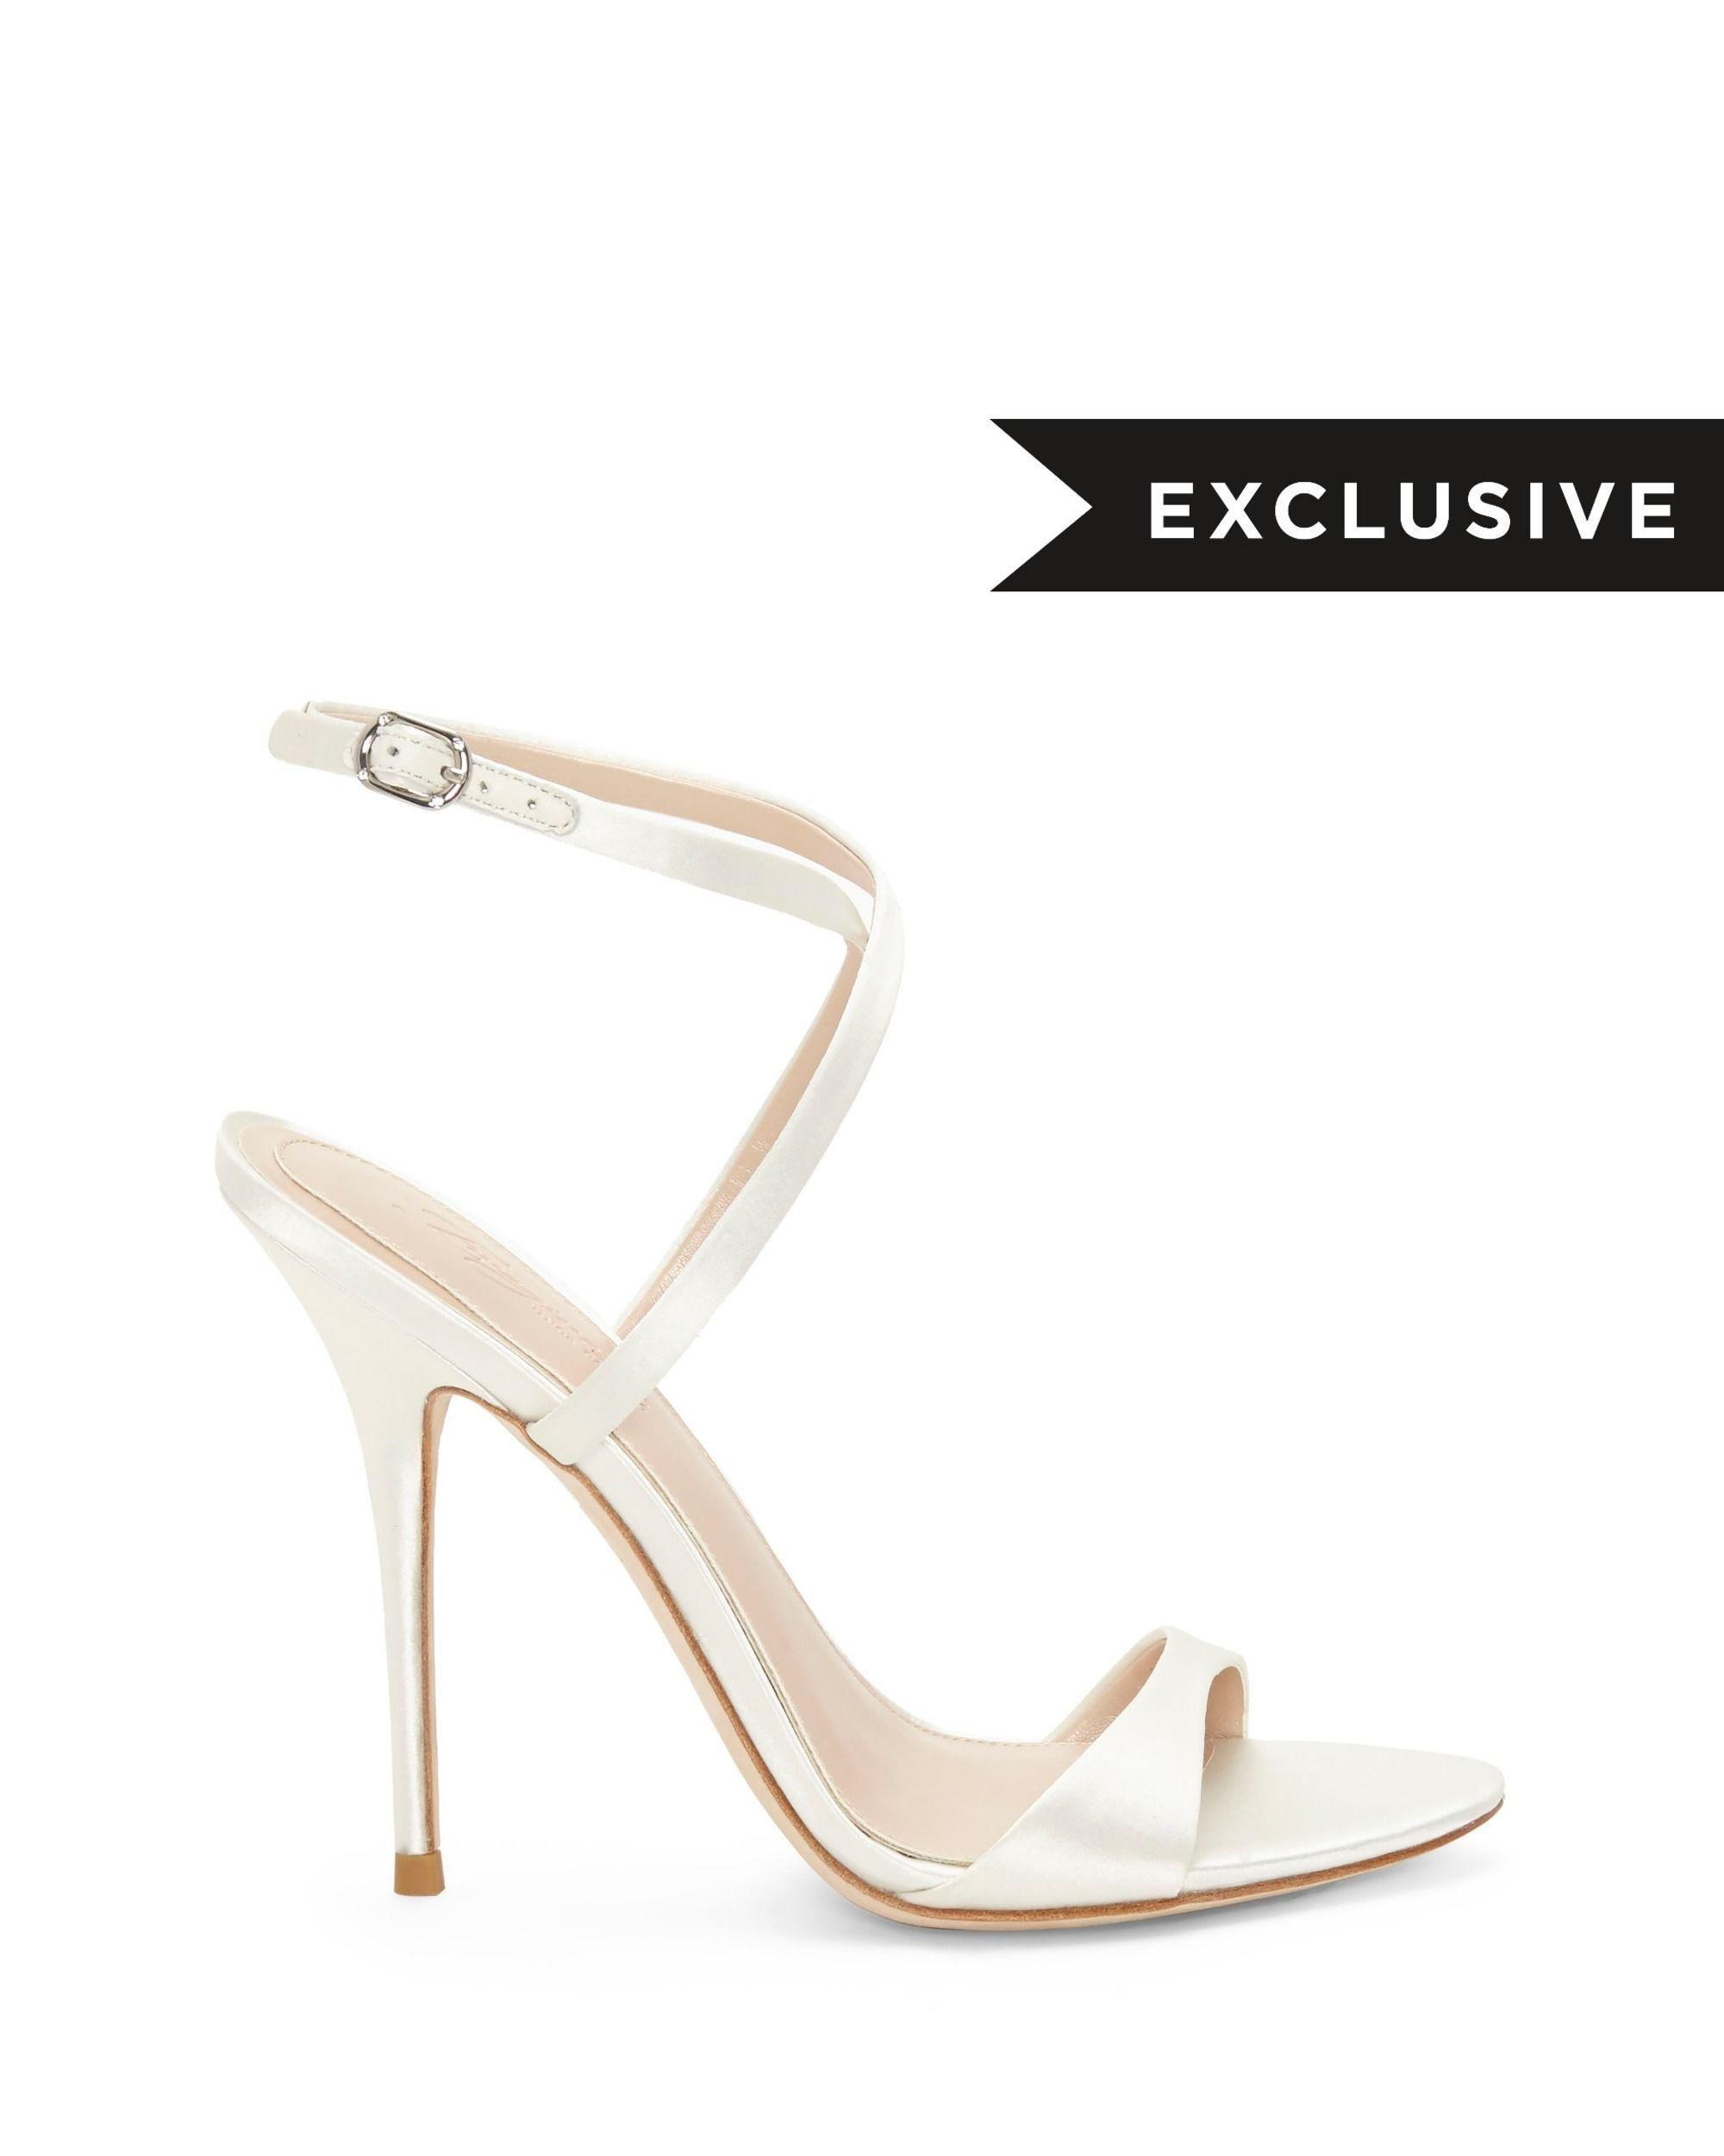 c569896812dd Lyst - Vince Camuto Imagine Rora – Crisscross-strap Sandal in White